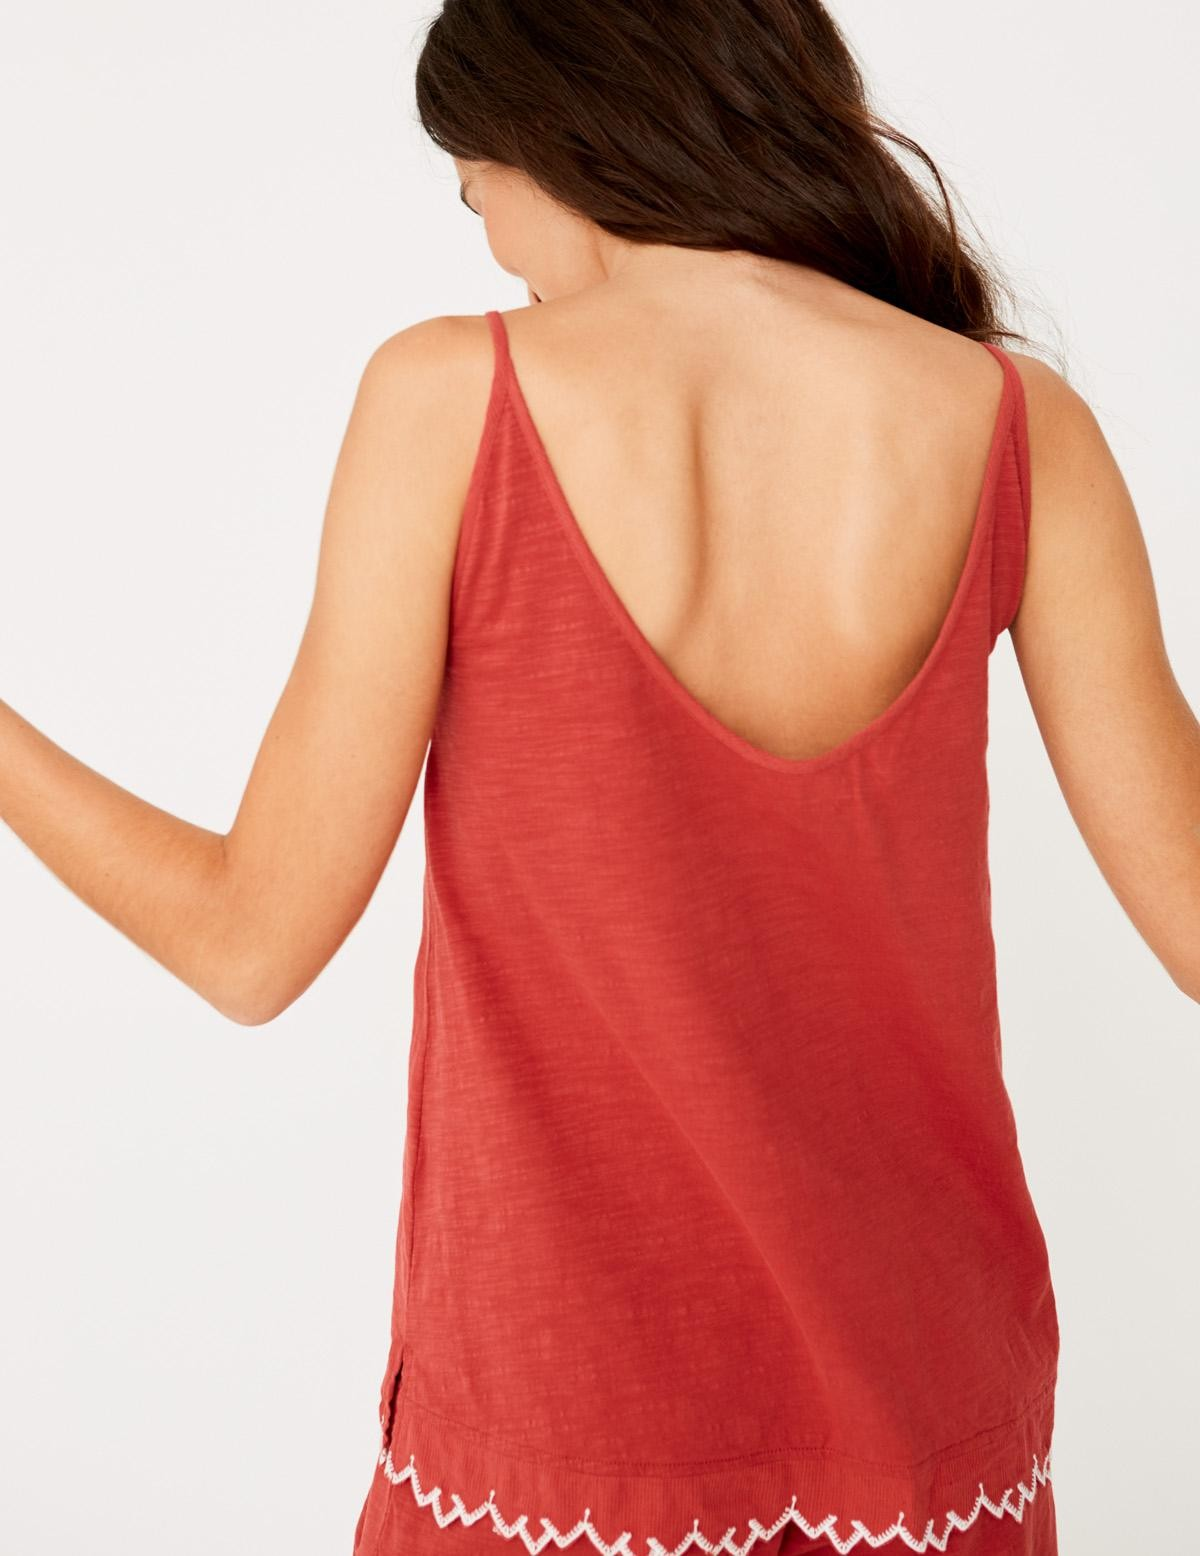 Camiseta puntilla bordada - Ítem1